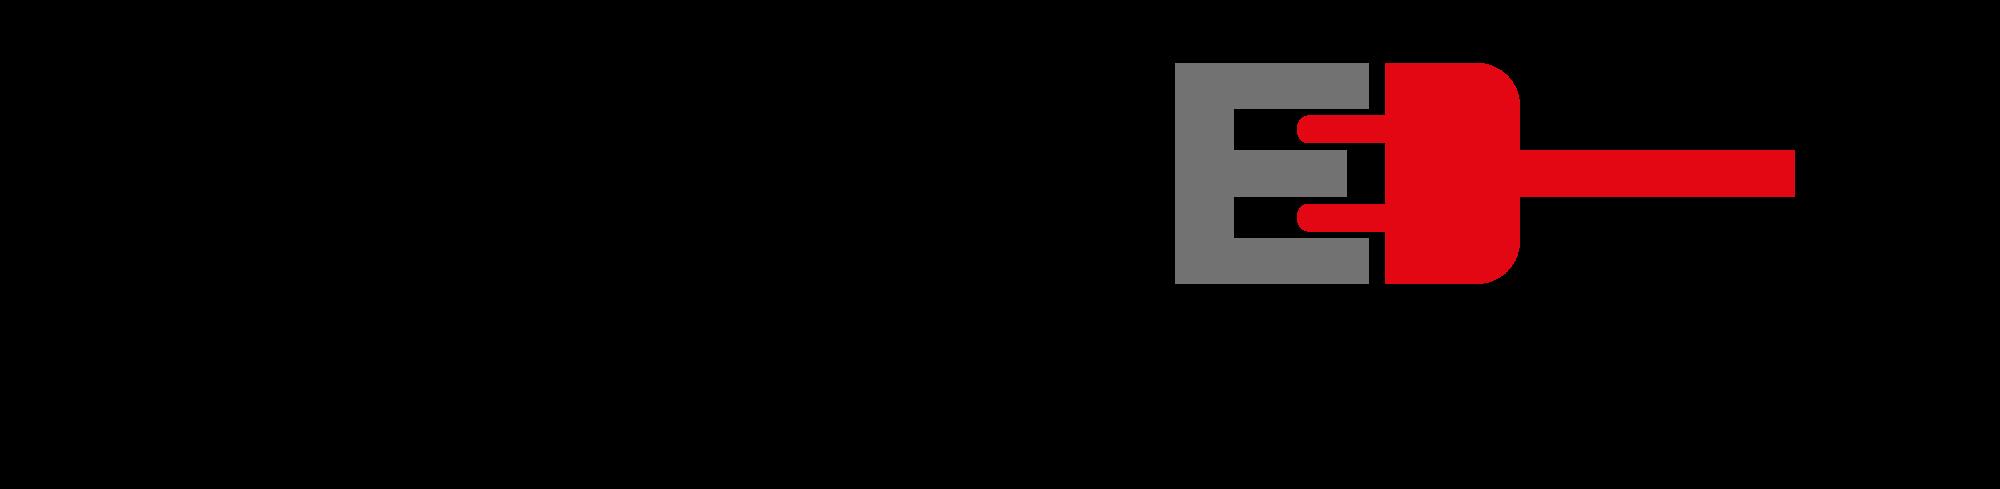 Tanke Logo